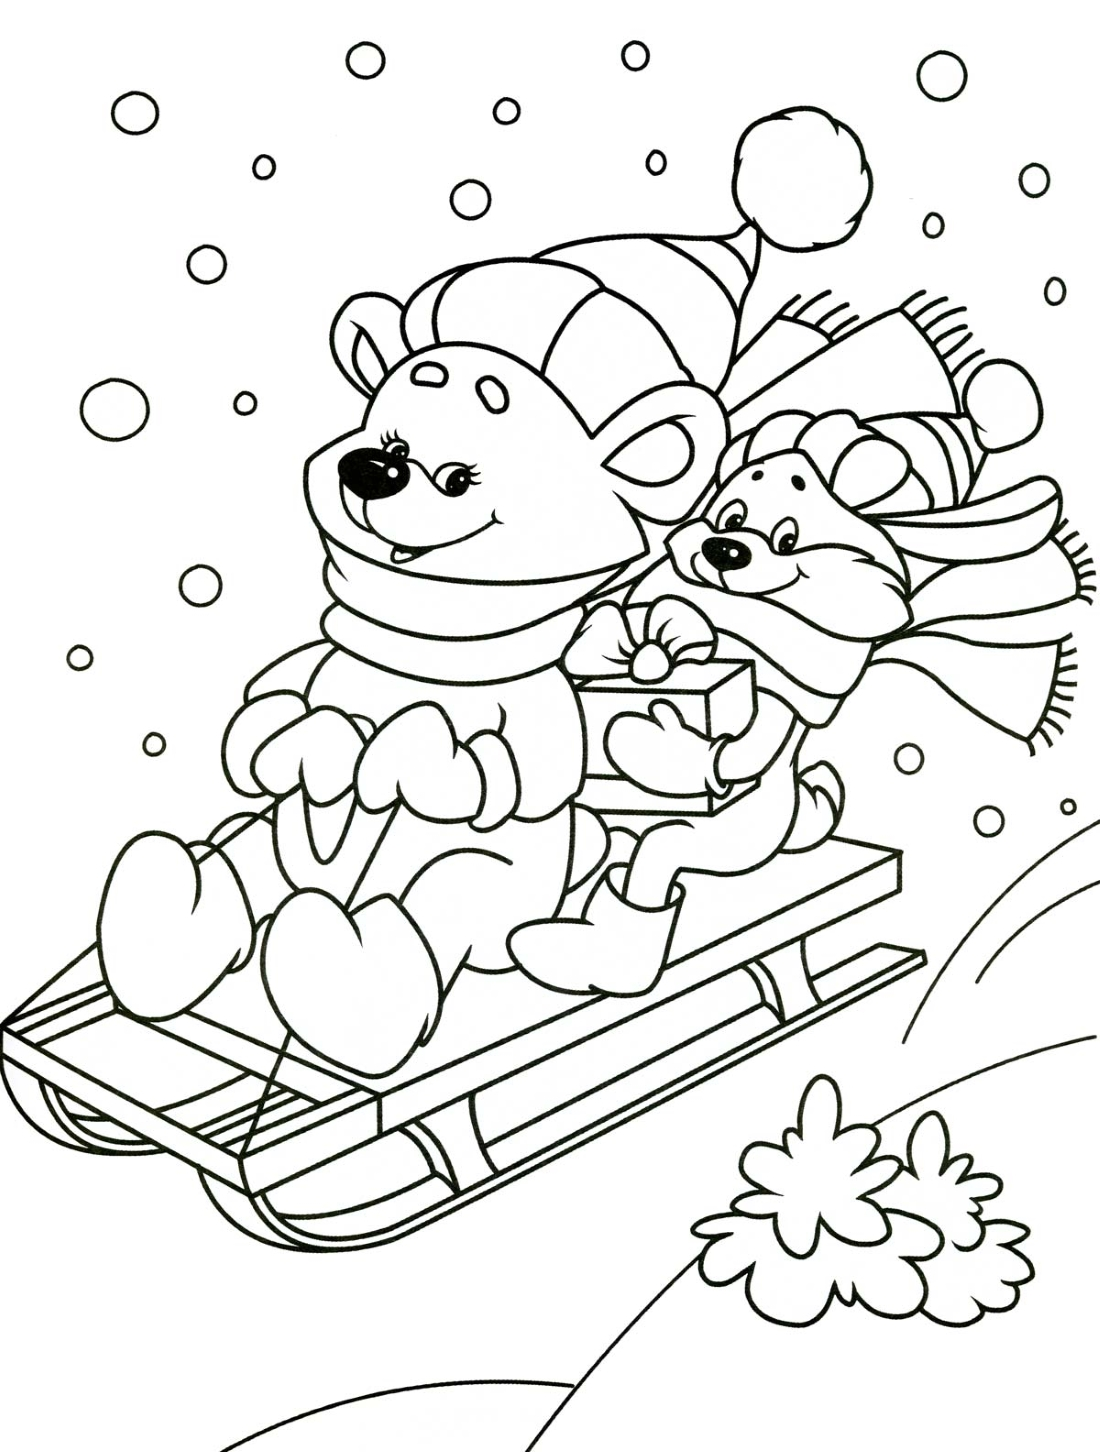 Раскрасить картинки на зиму